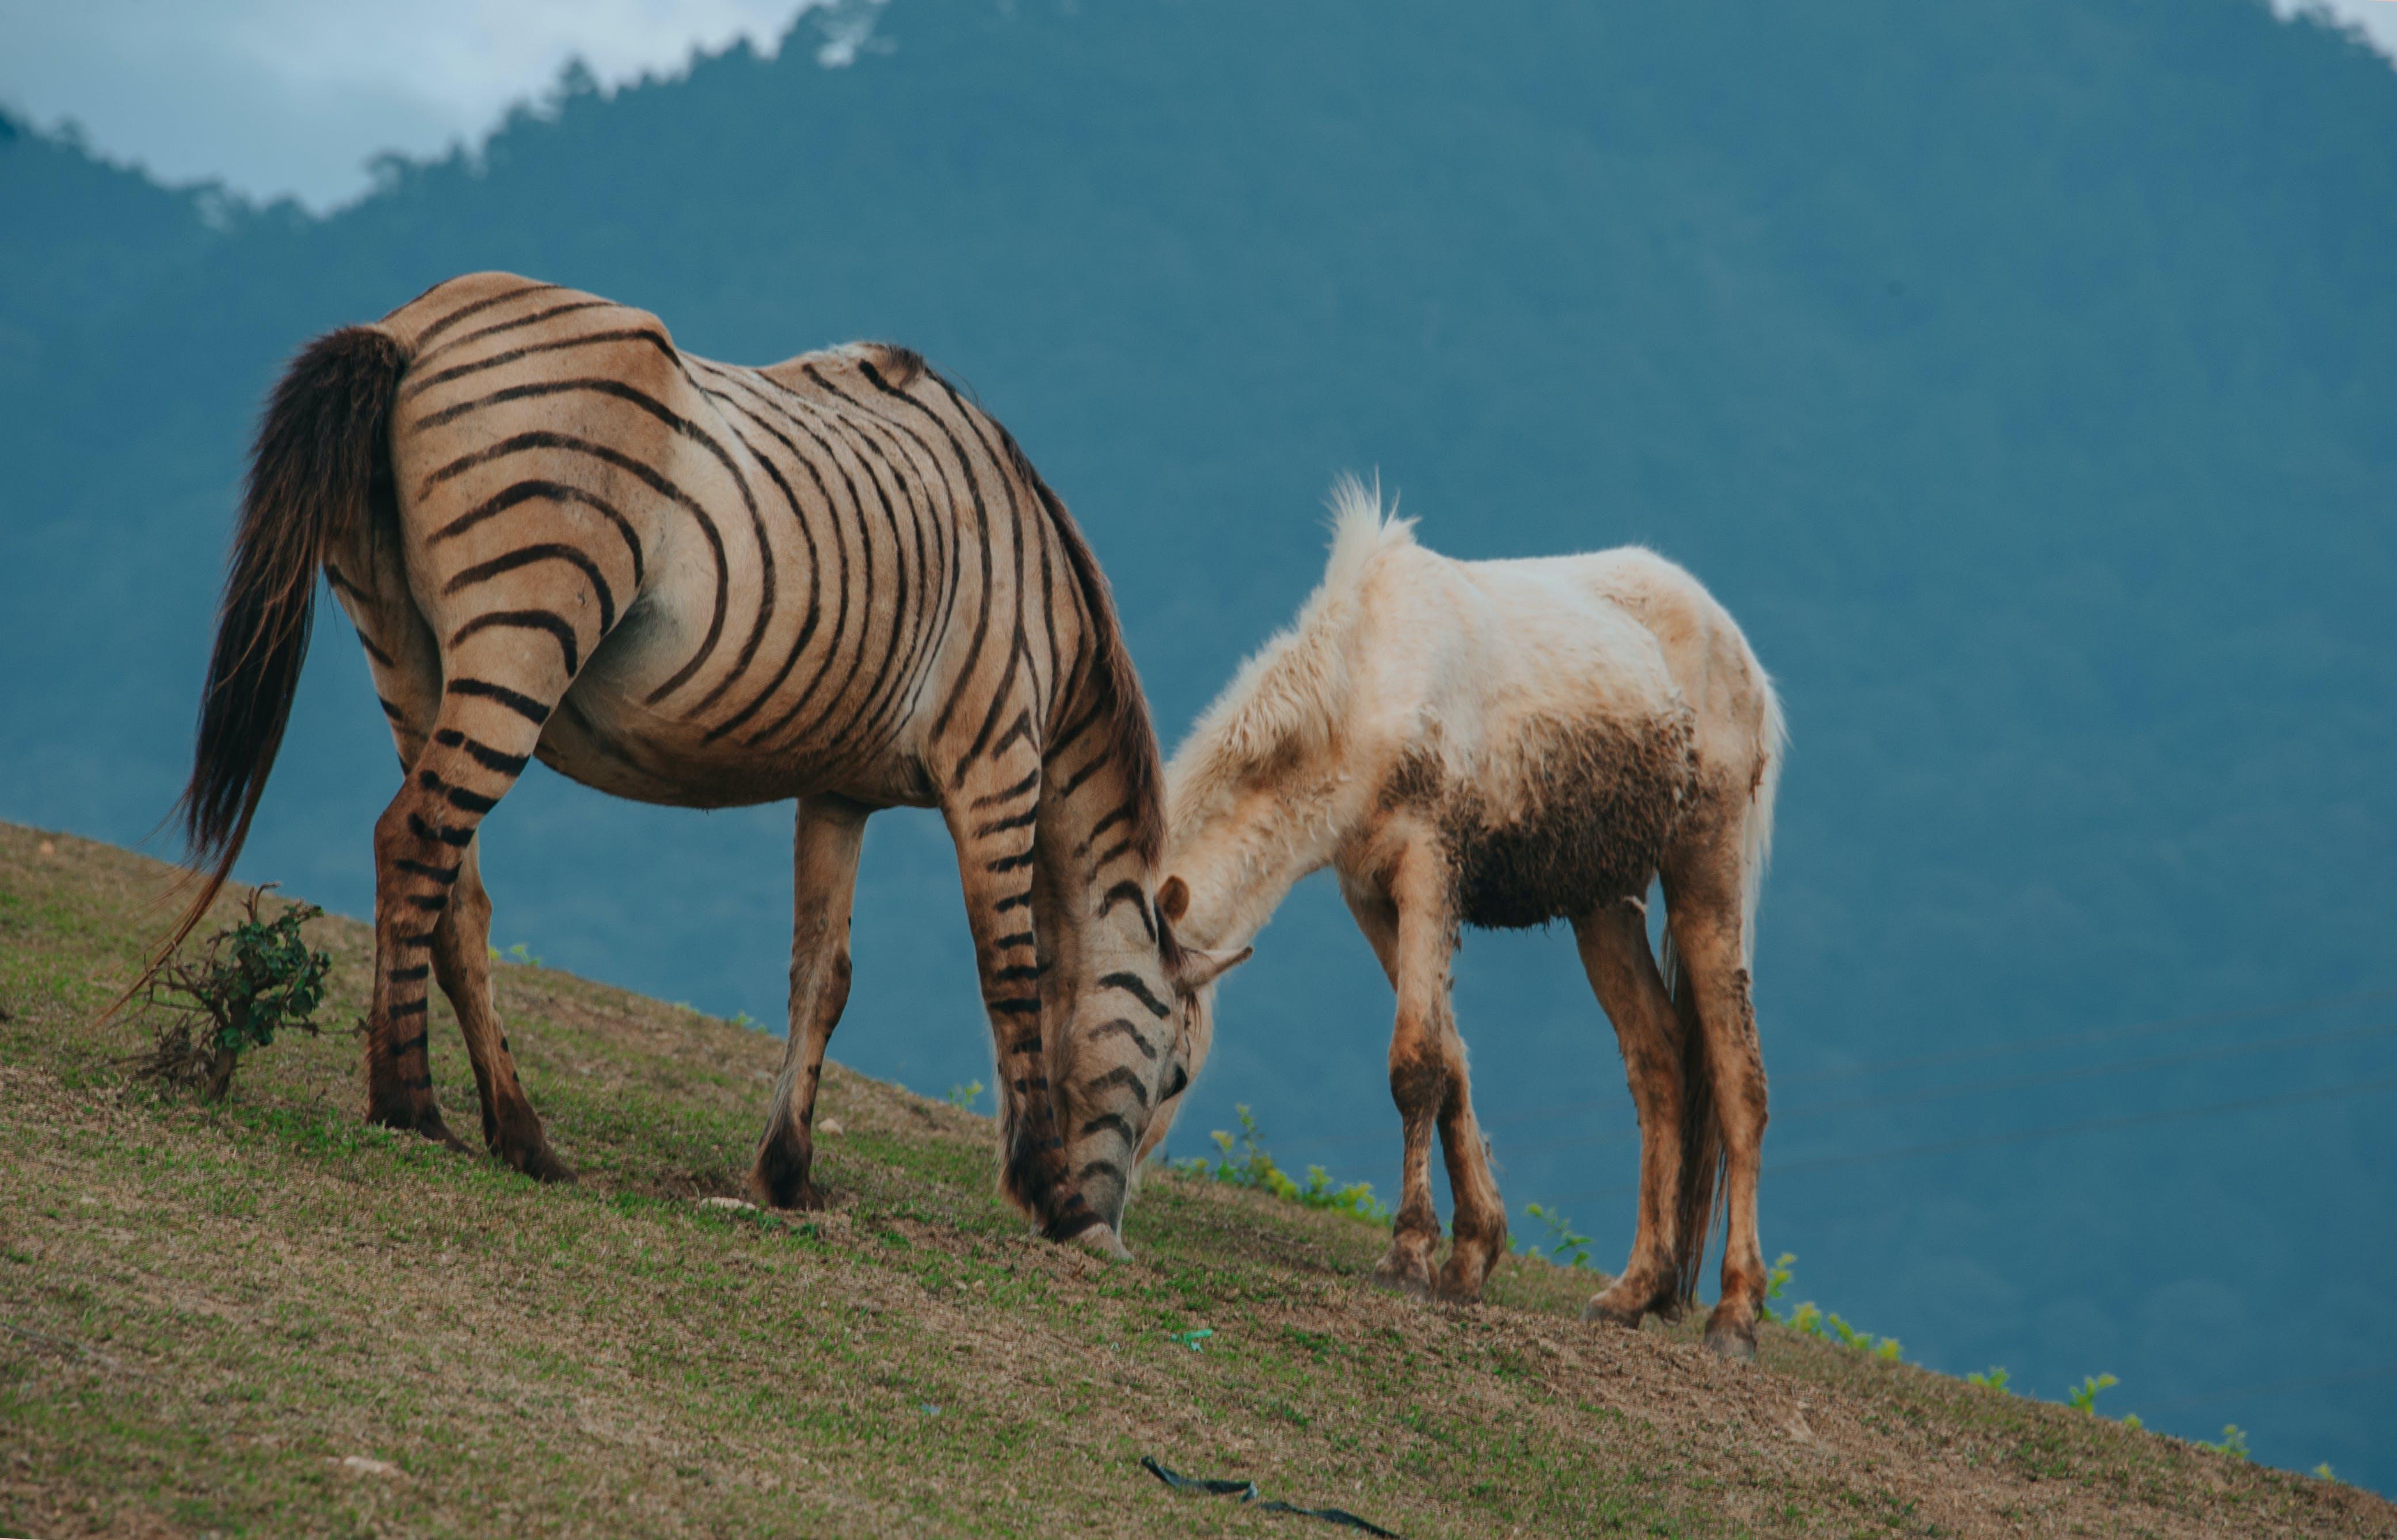 Brown and Black Zebra Beside White Horse